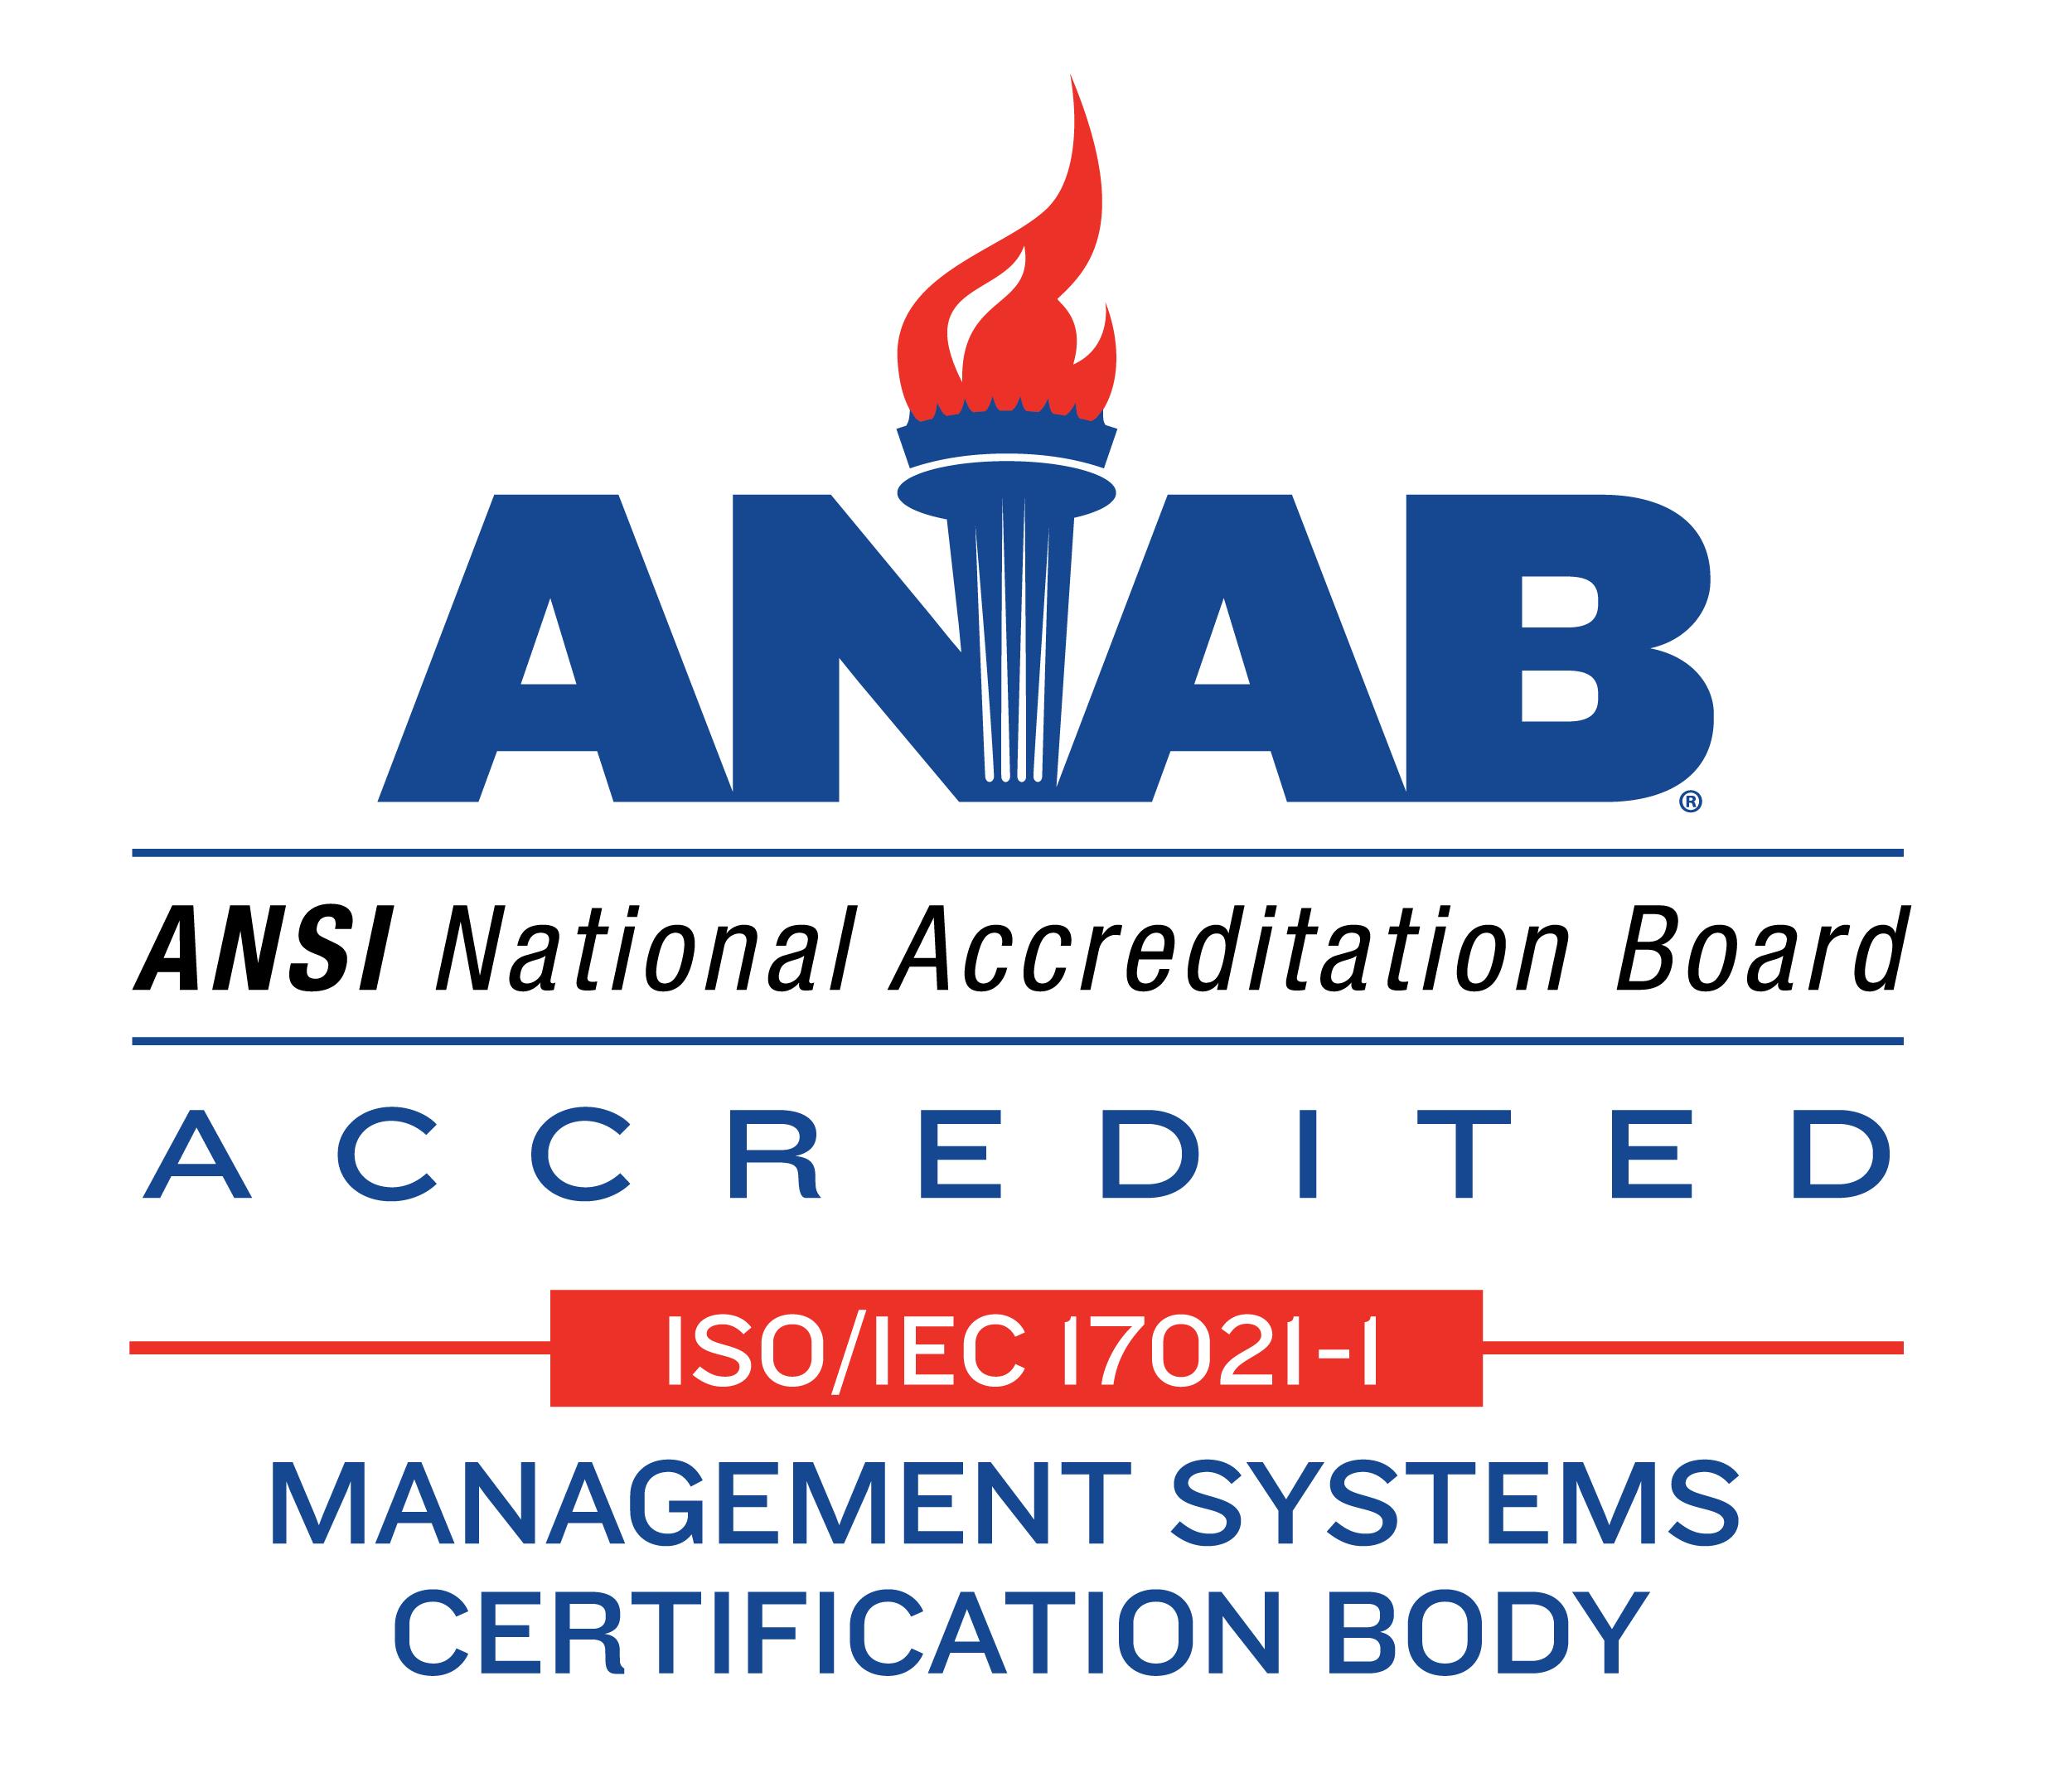 ANSI National Accreditation Board - ANAB logo